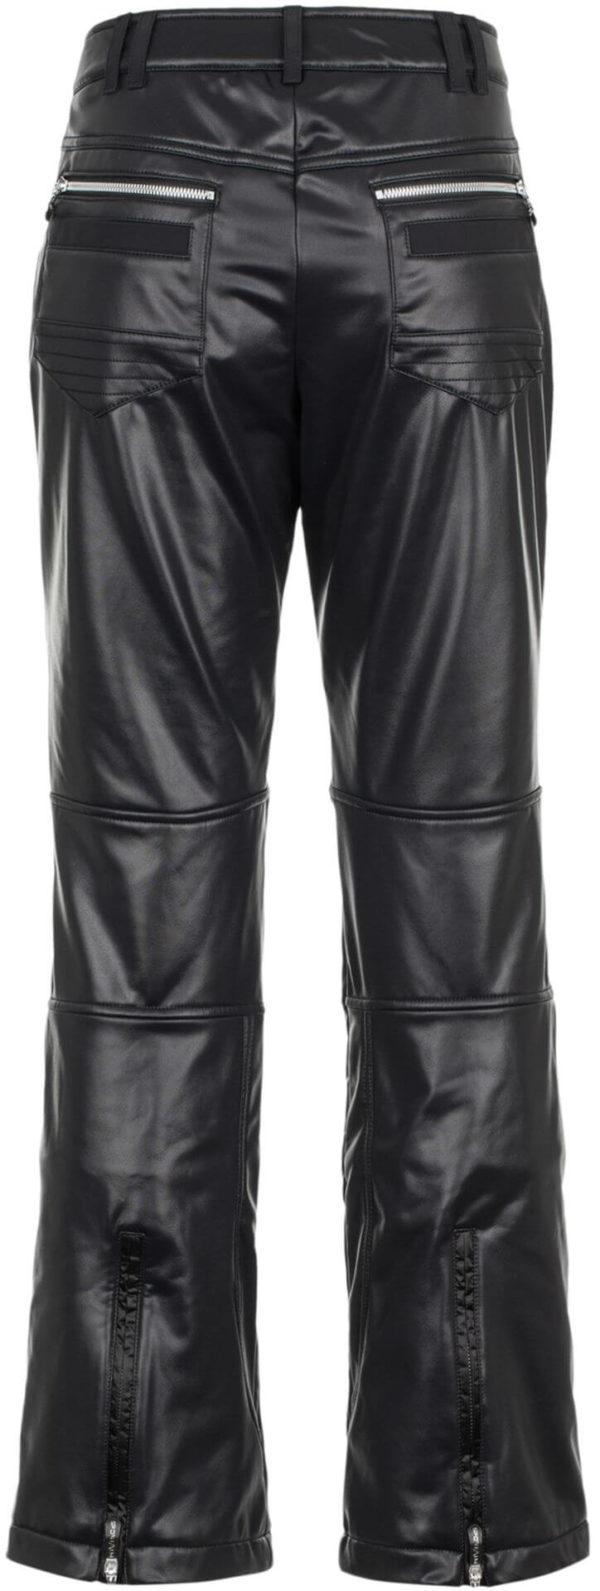 Женские брюки SAMI SN - фото 2